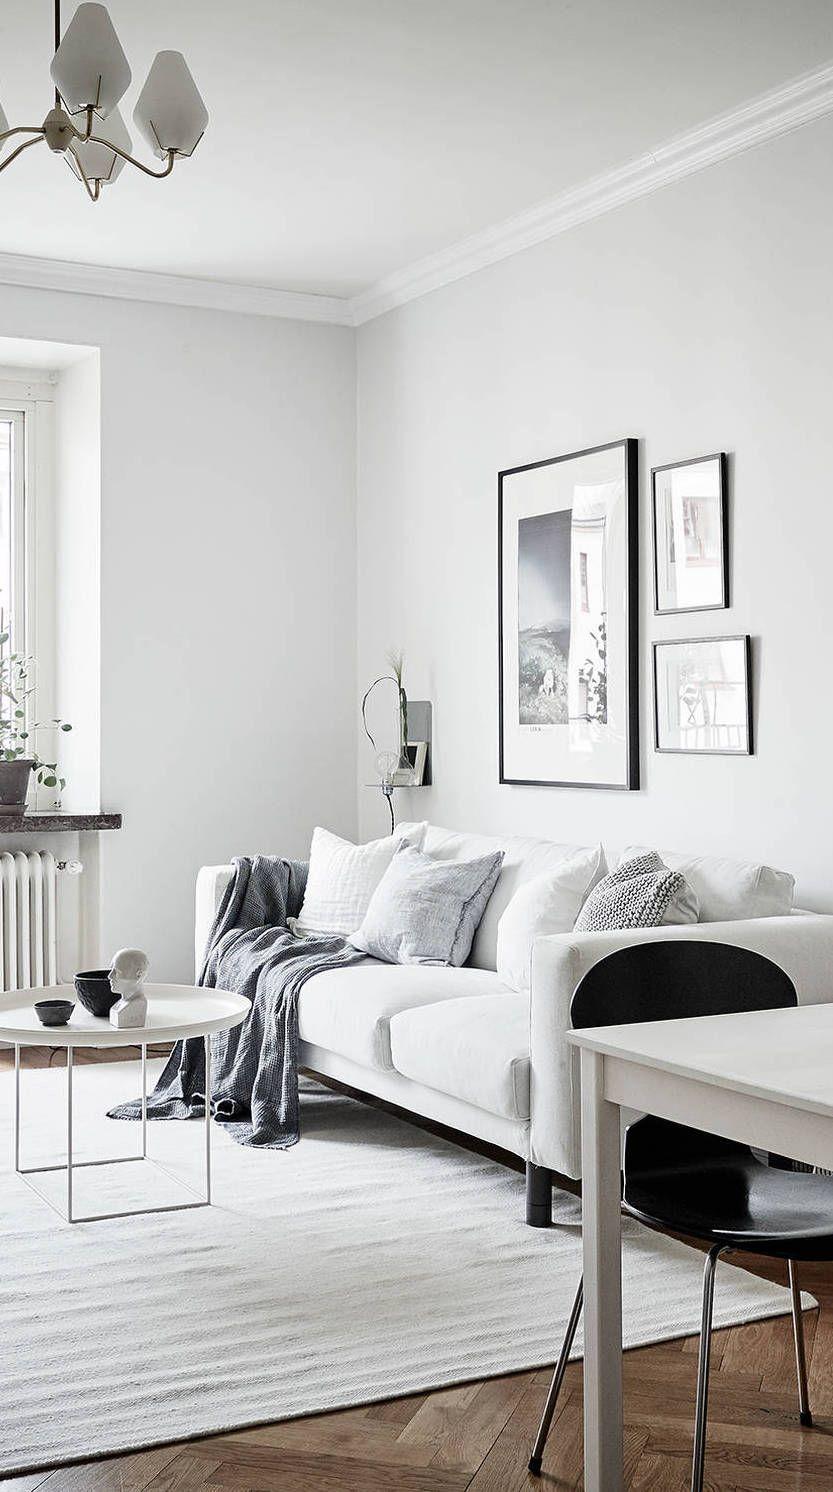 Cozy home with a vintage touch | Kleine räume | Pinterest | Maison ...